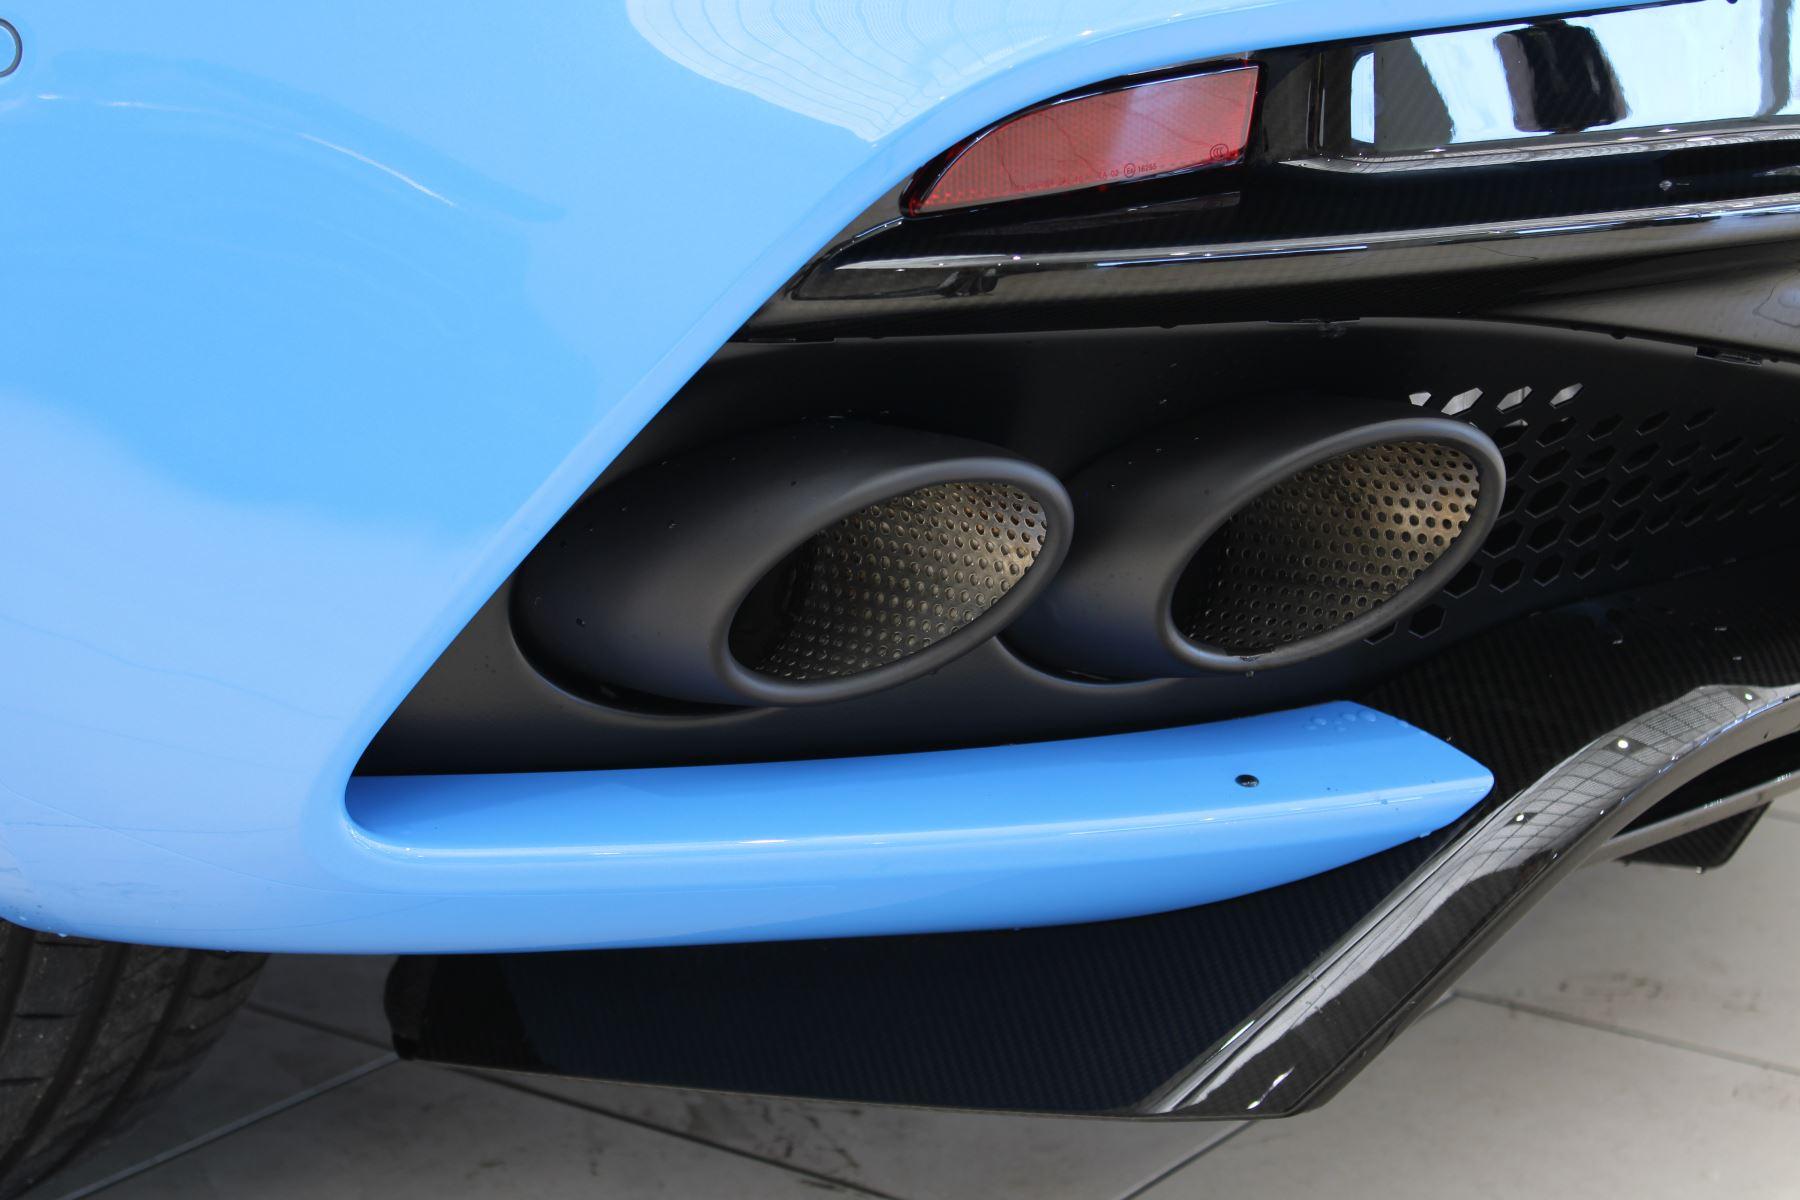 Aston Martin DBS V12 Superleggera Touchtronic Special Ceramic Blue - B&O image 16